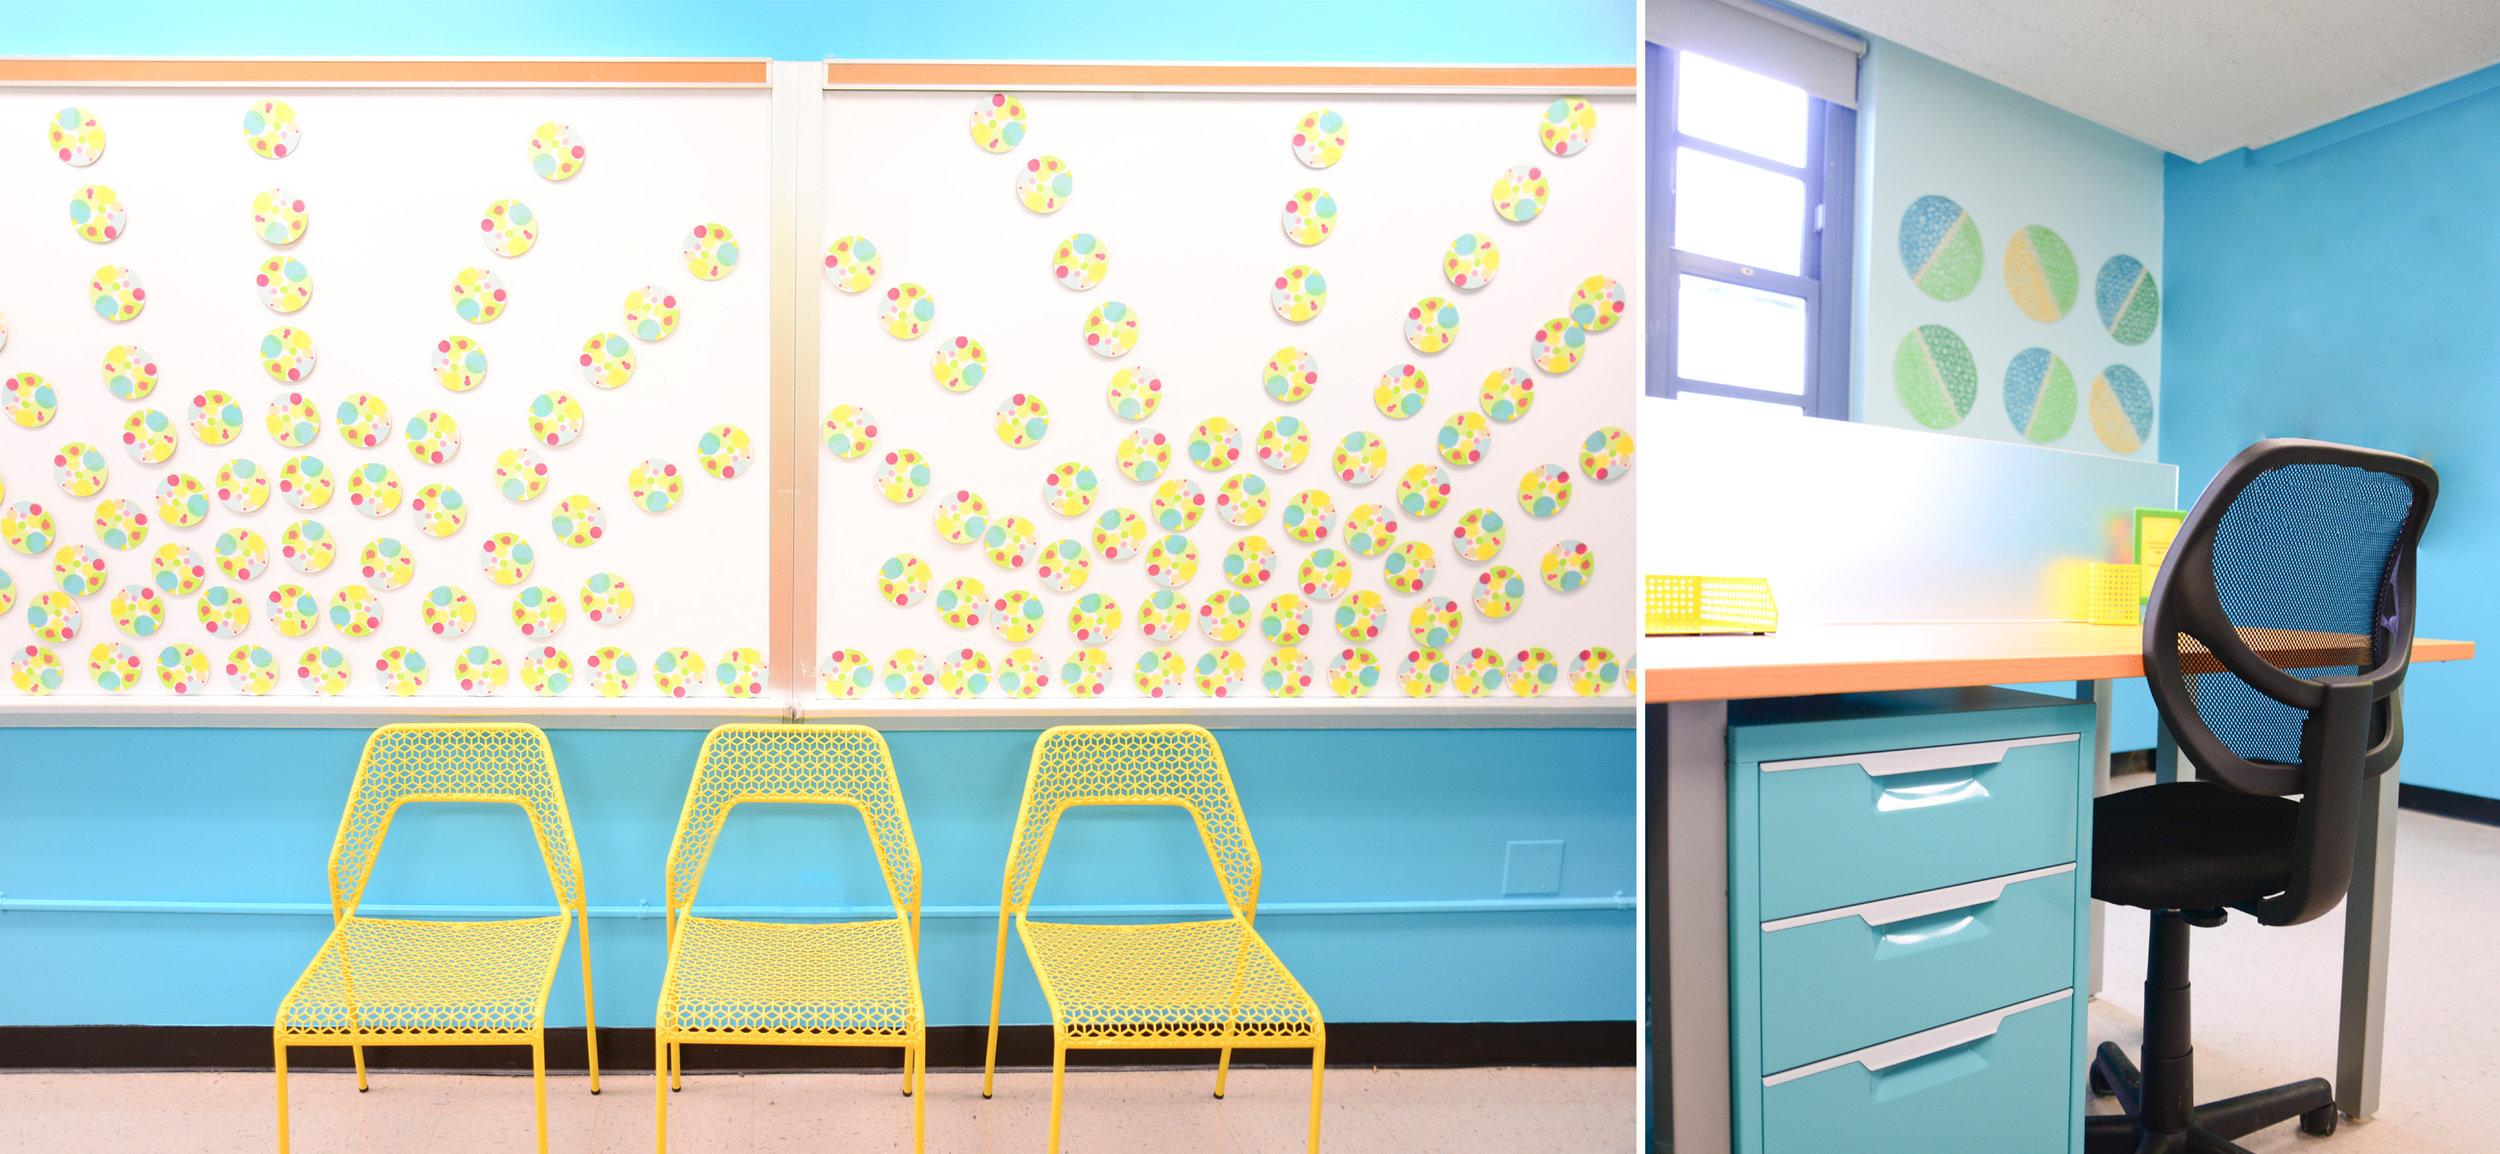 School_Main_Office.jpg